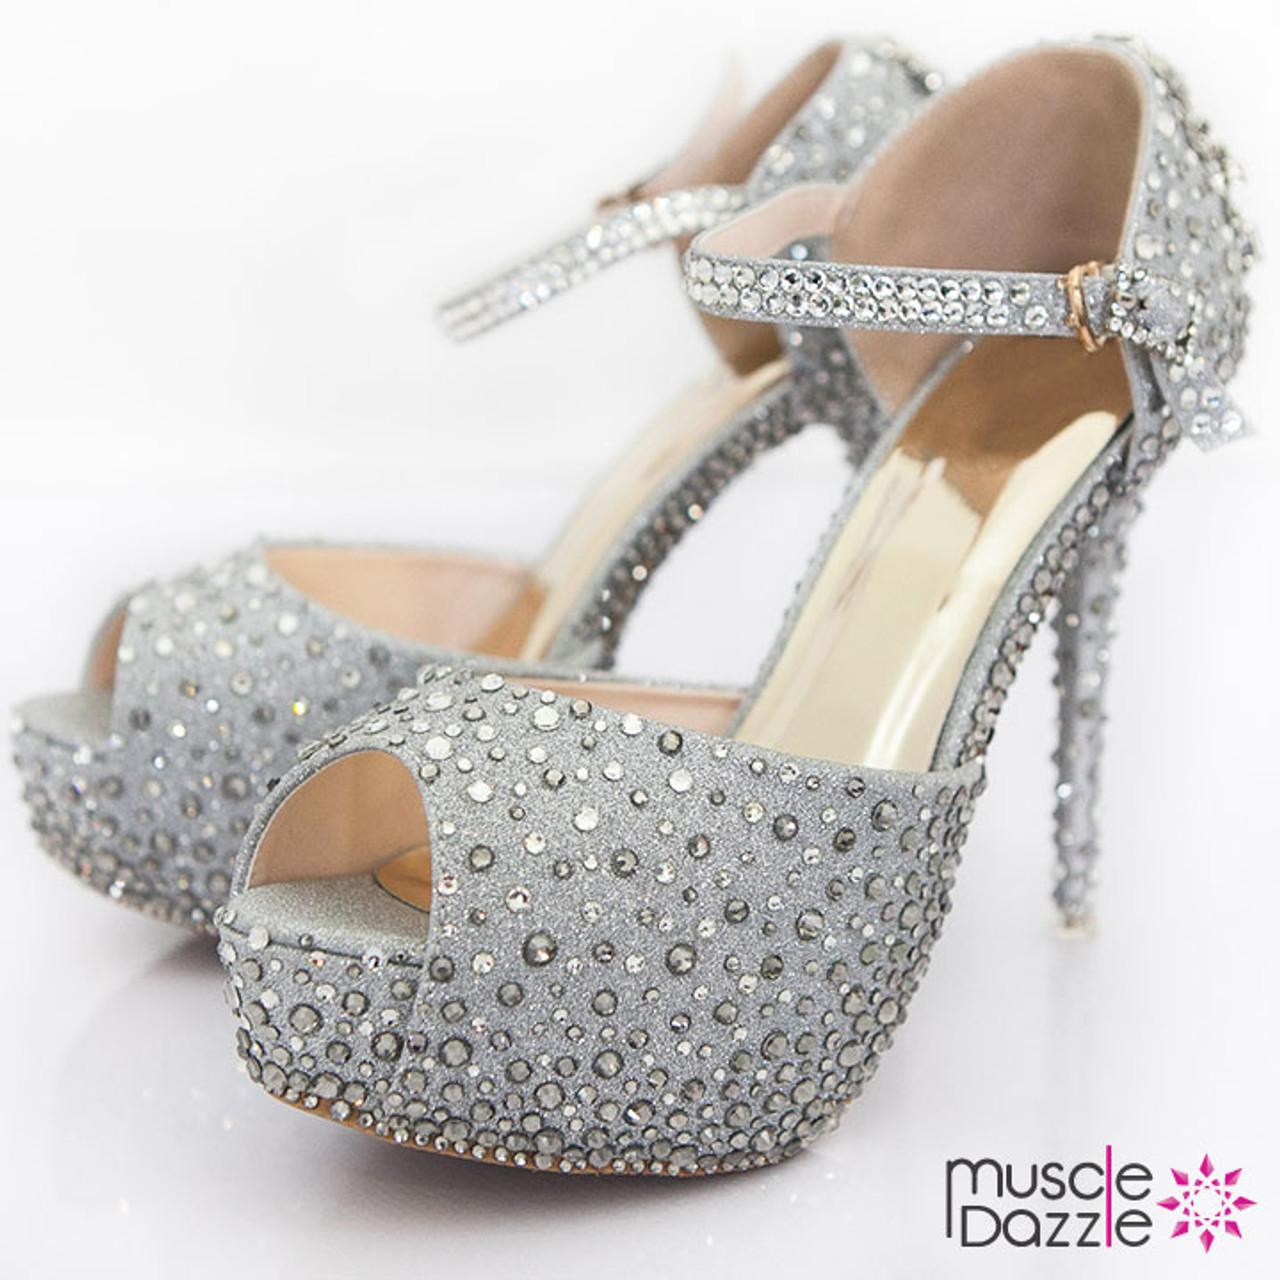 Silver glitter high heel platform pumps with crystals 6bf3753075